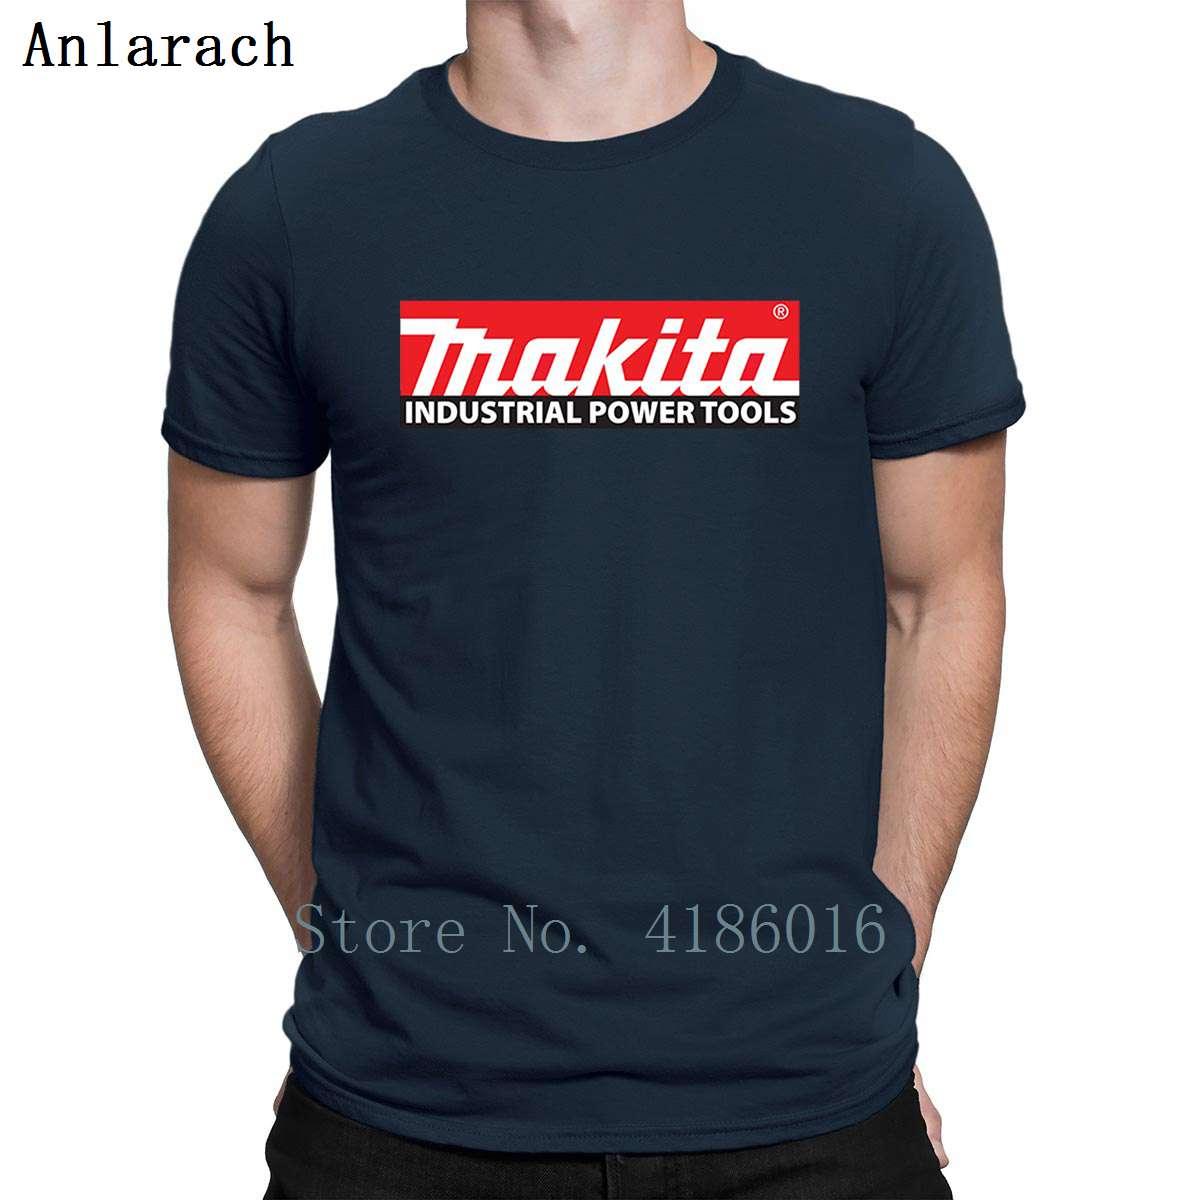 new Makita Power Tools logo tour USA 2020 Long sleeve Men/'s T-Shirt S-5XL black